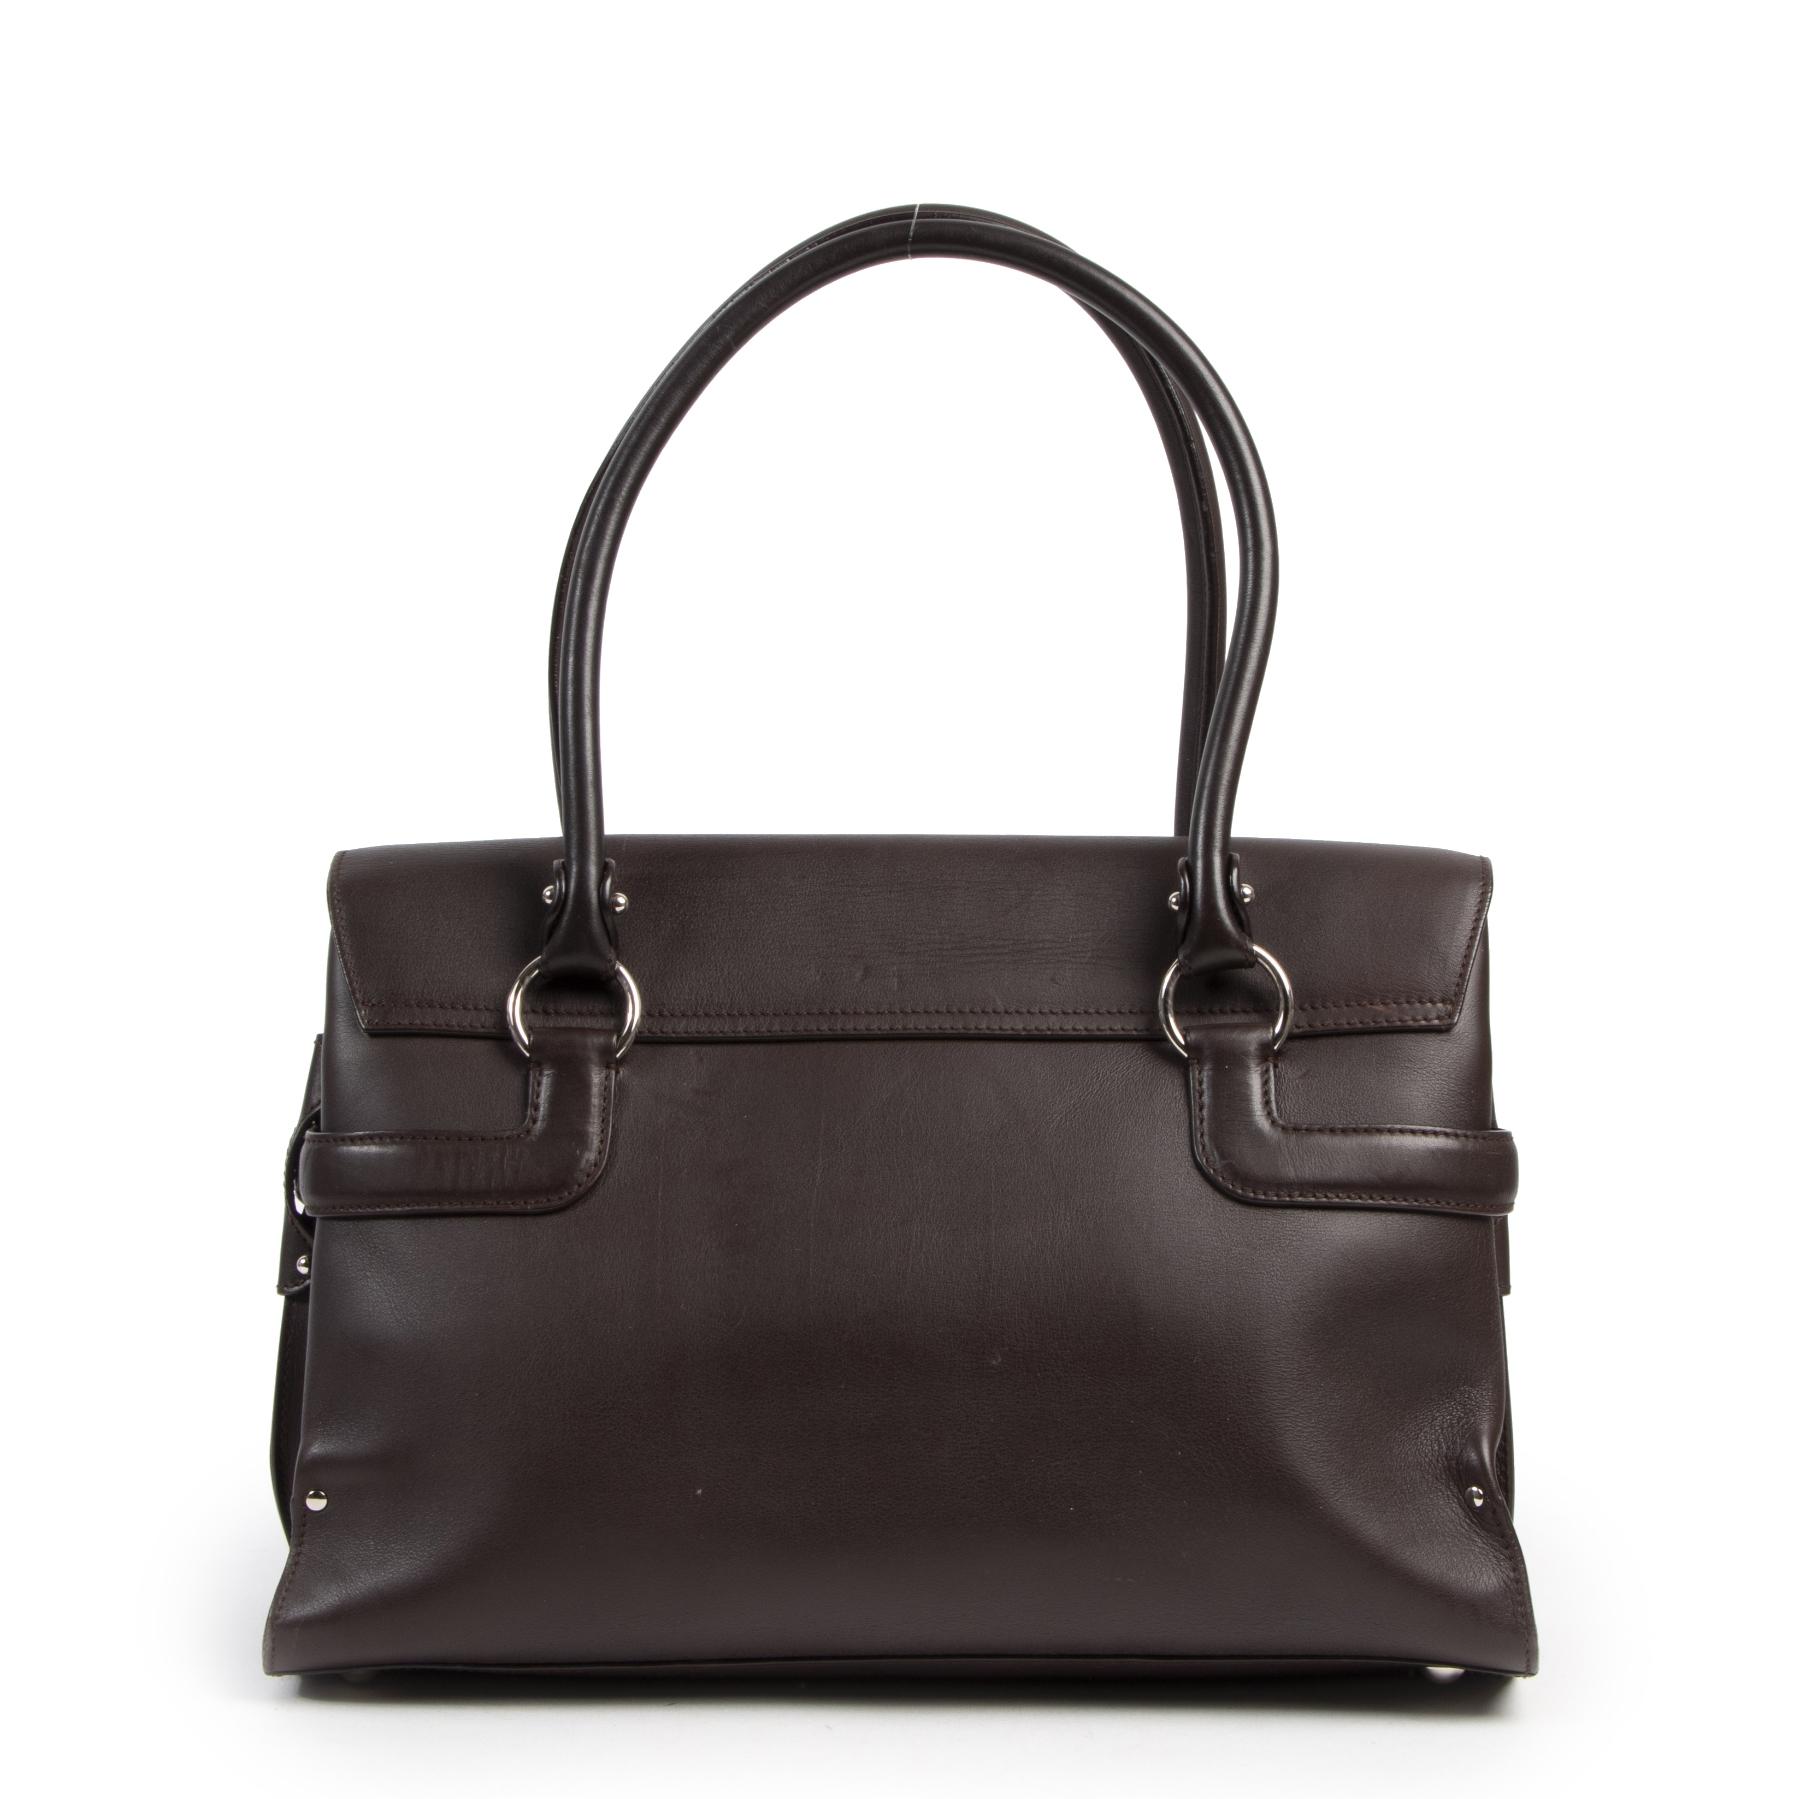 Salvatore Ferragamo Brown Top Handle Bag for the best price at Labellov